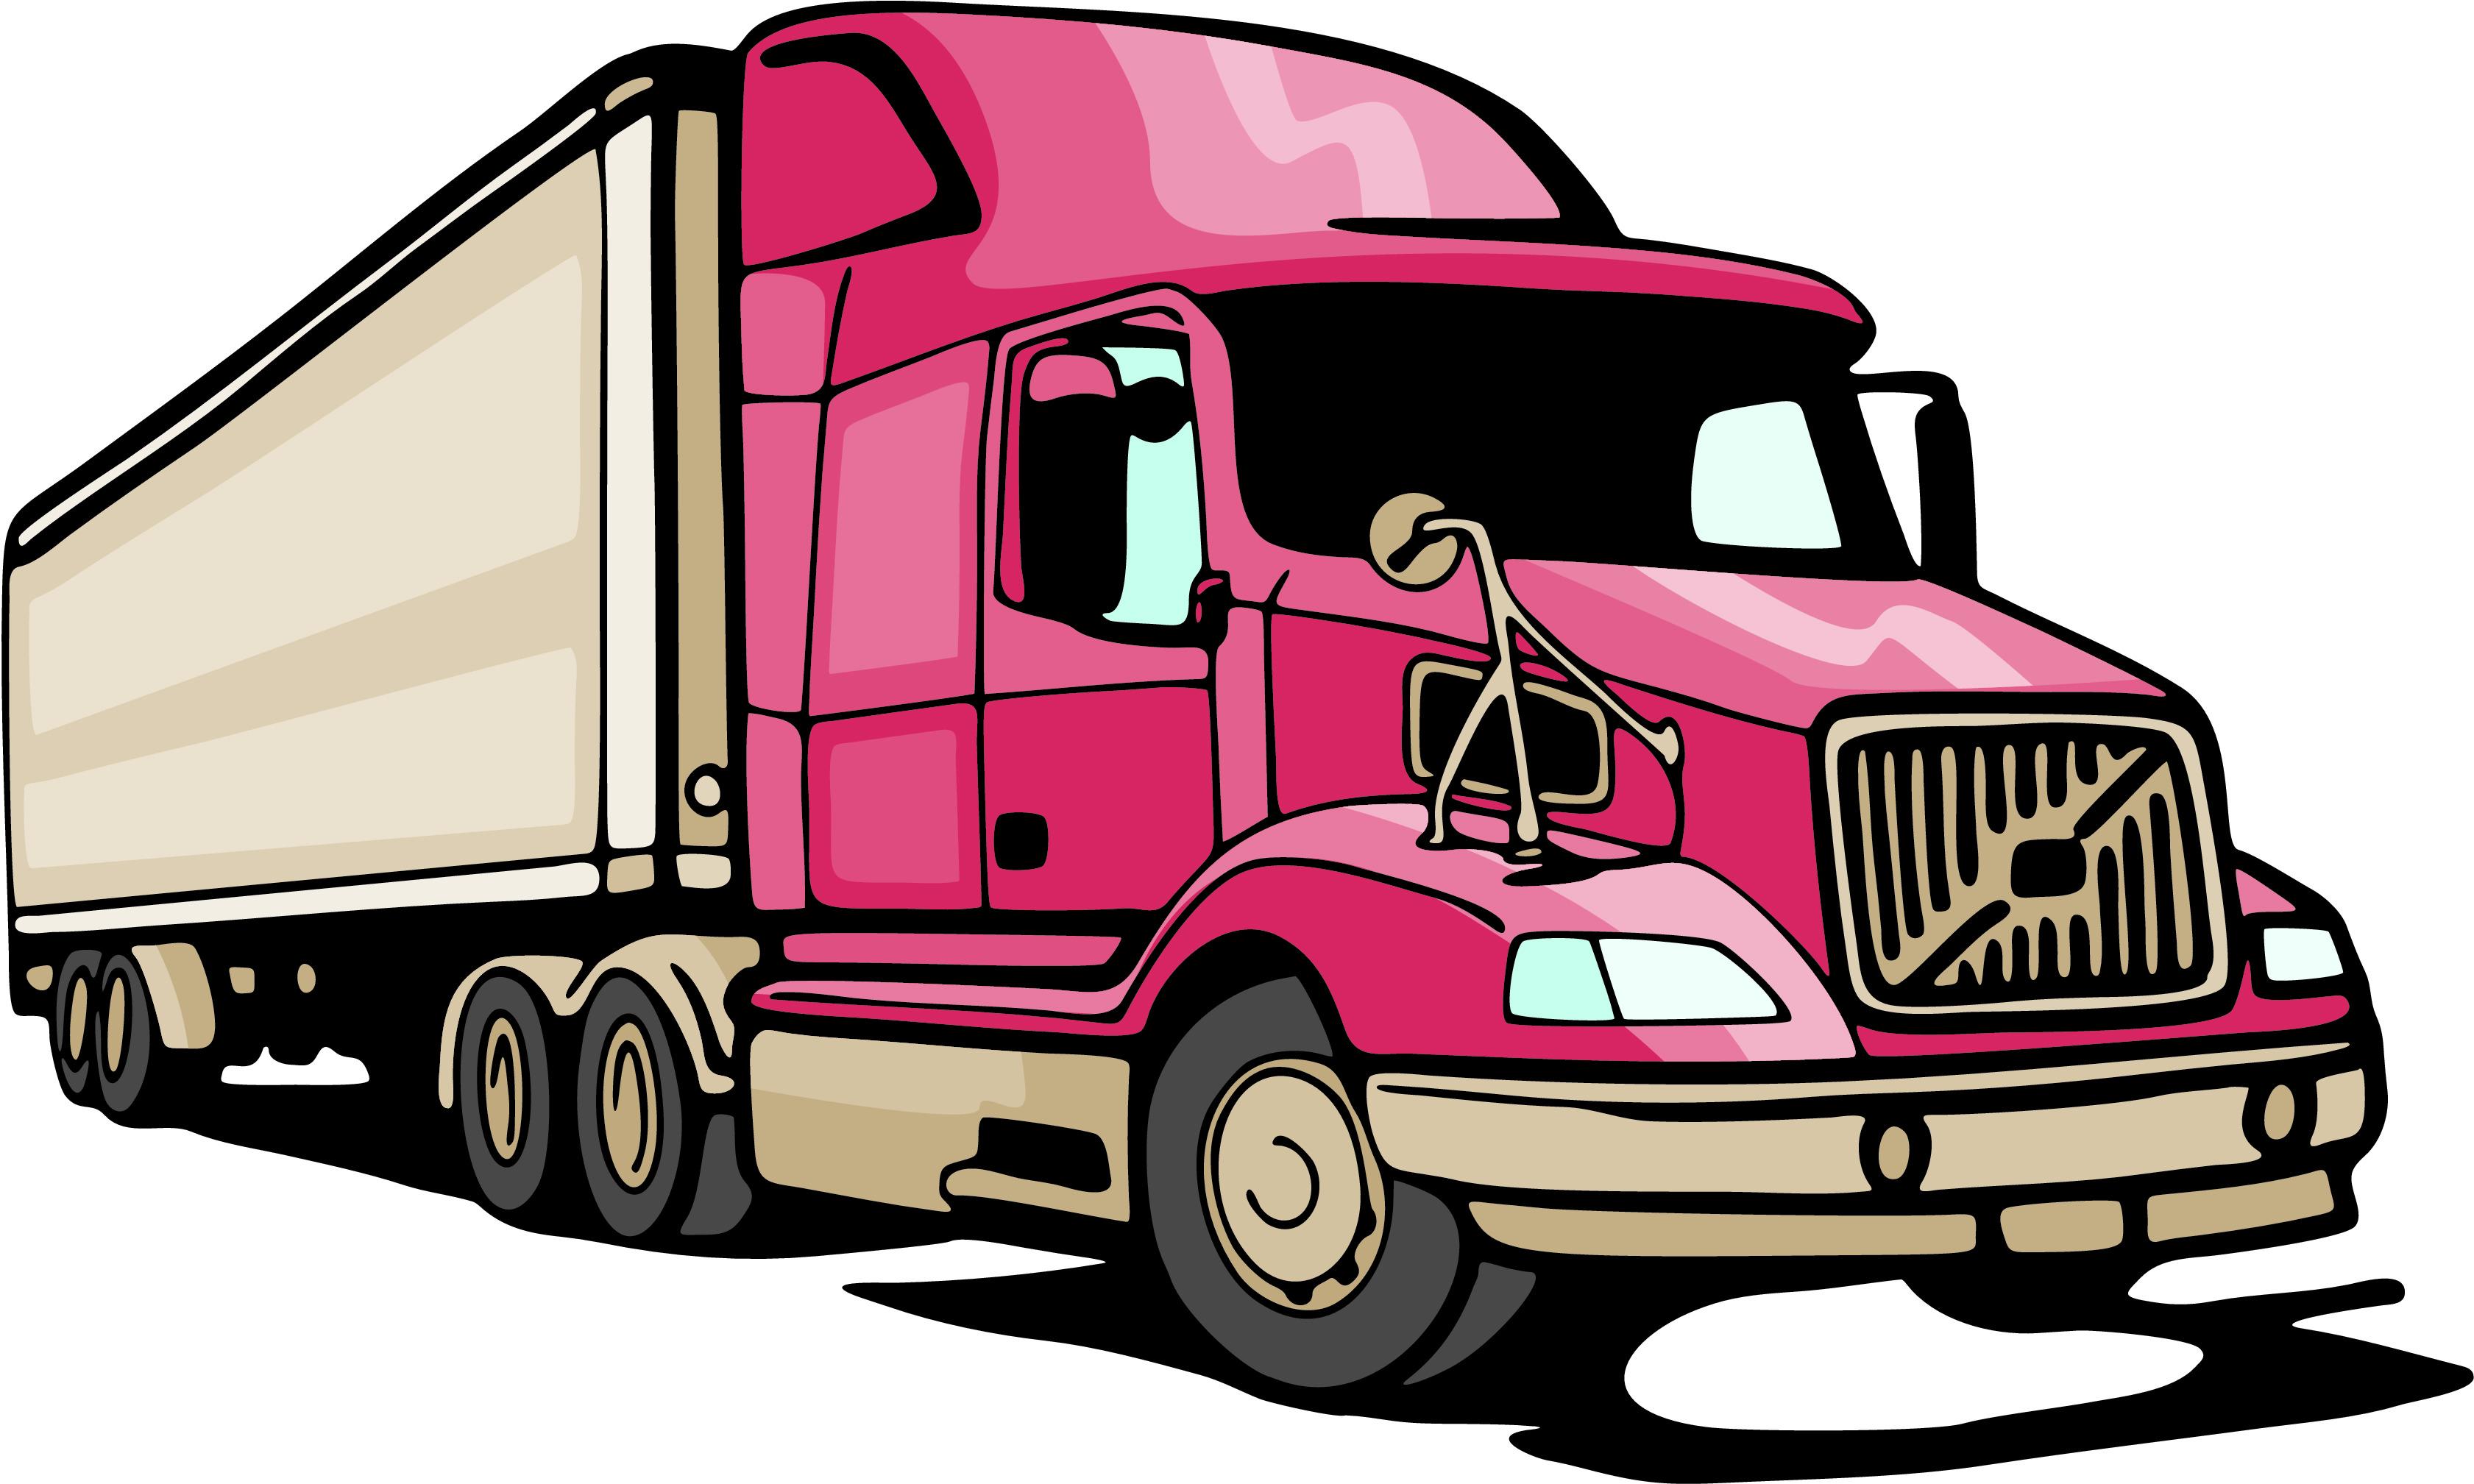 Manaty Transportation Inc